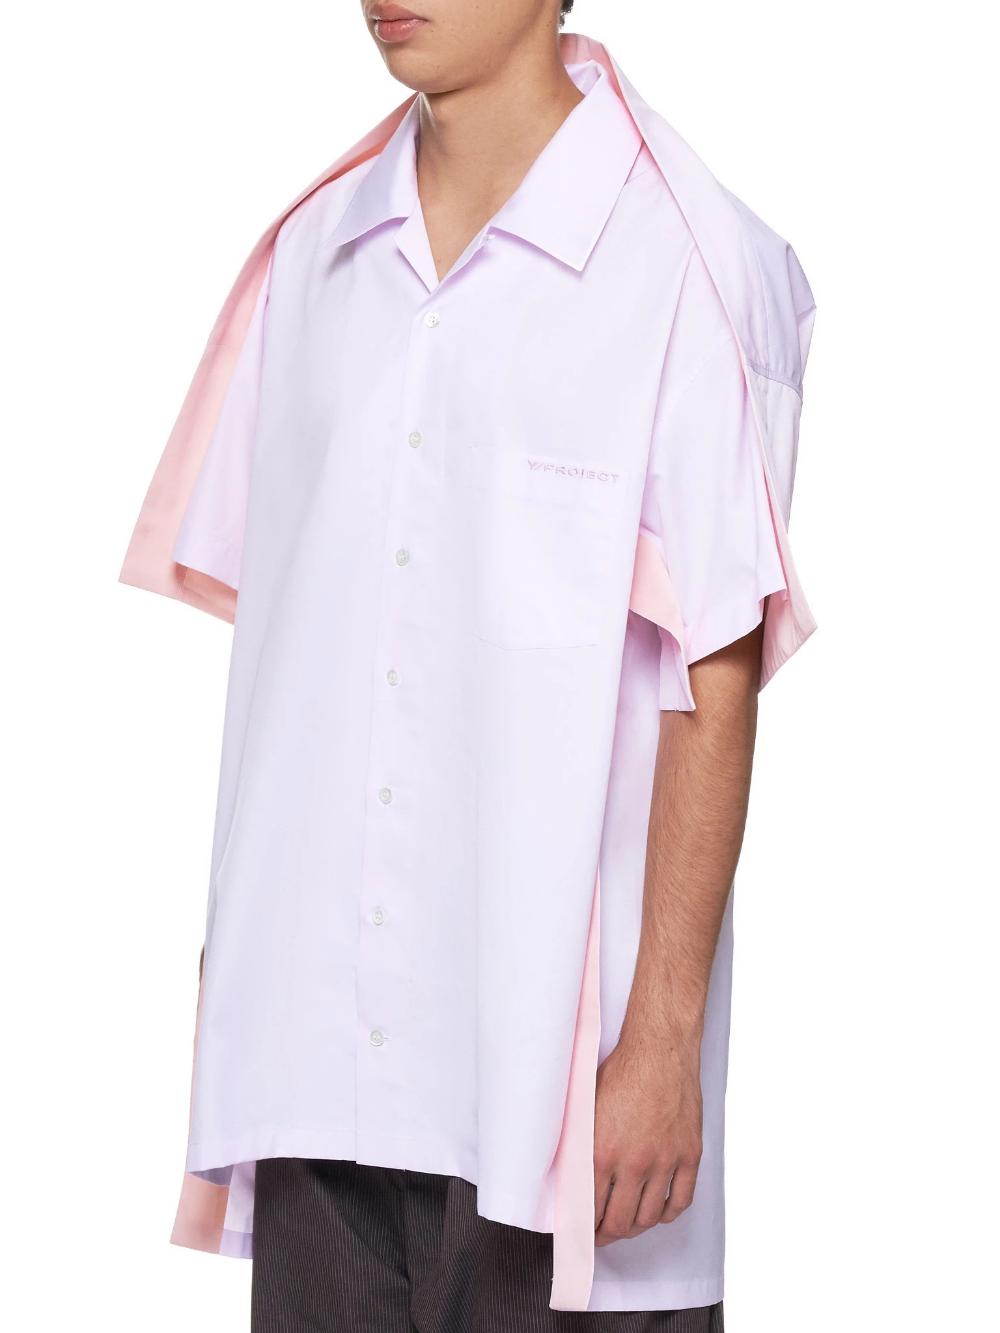 Light Pink Bowling Shirt